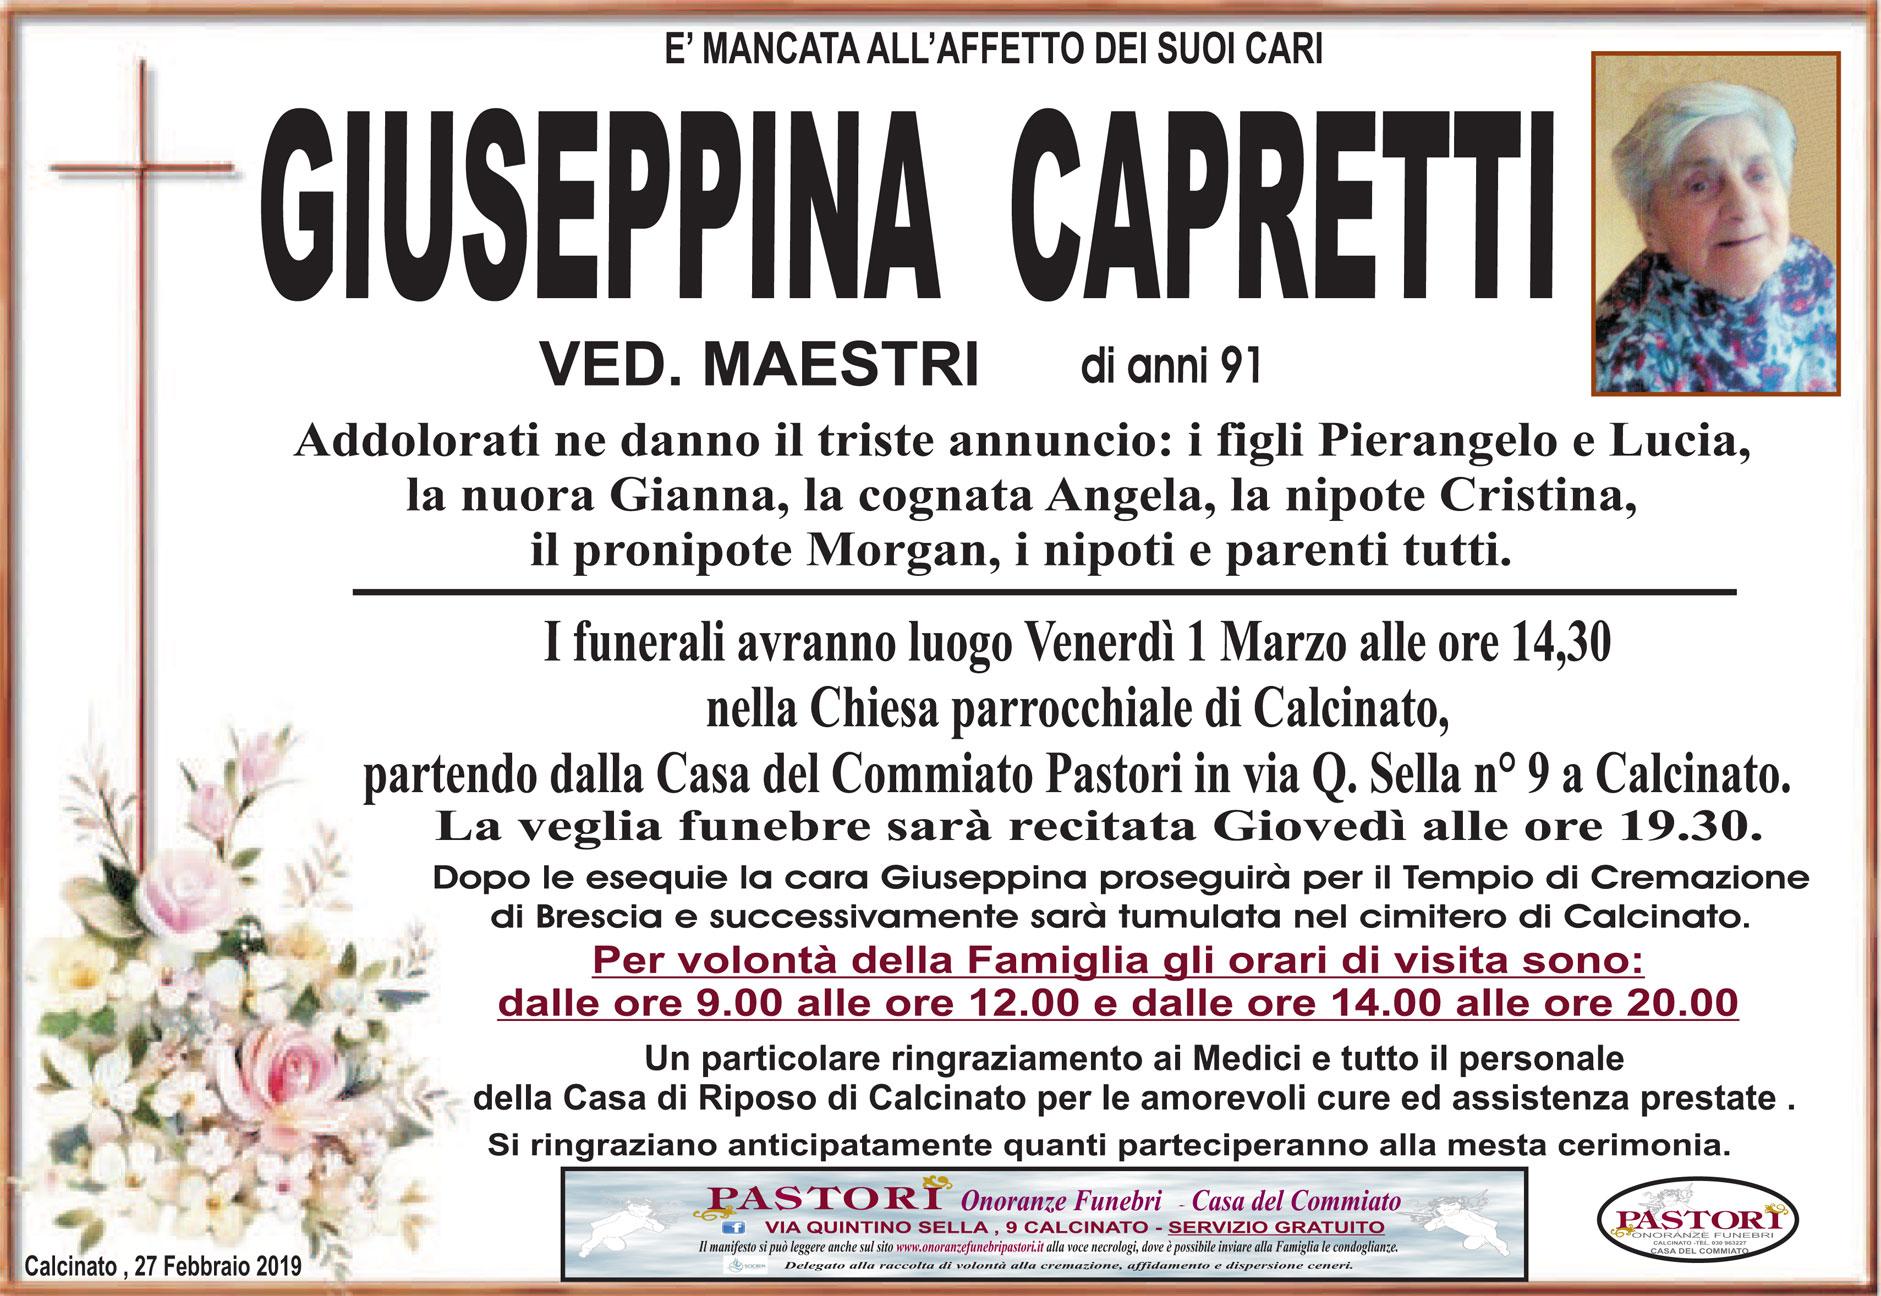 Giuseppina Capretti